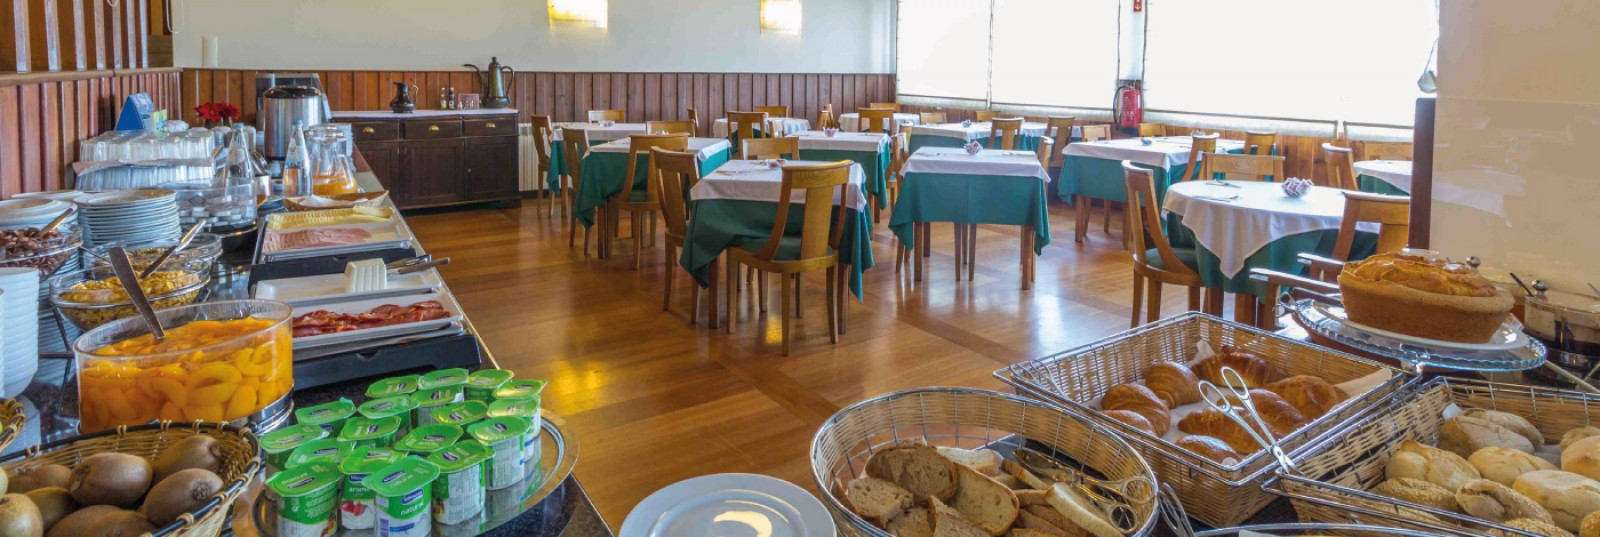 Hotel Eurosol Seia Camelo - breakfast